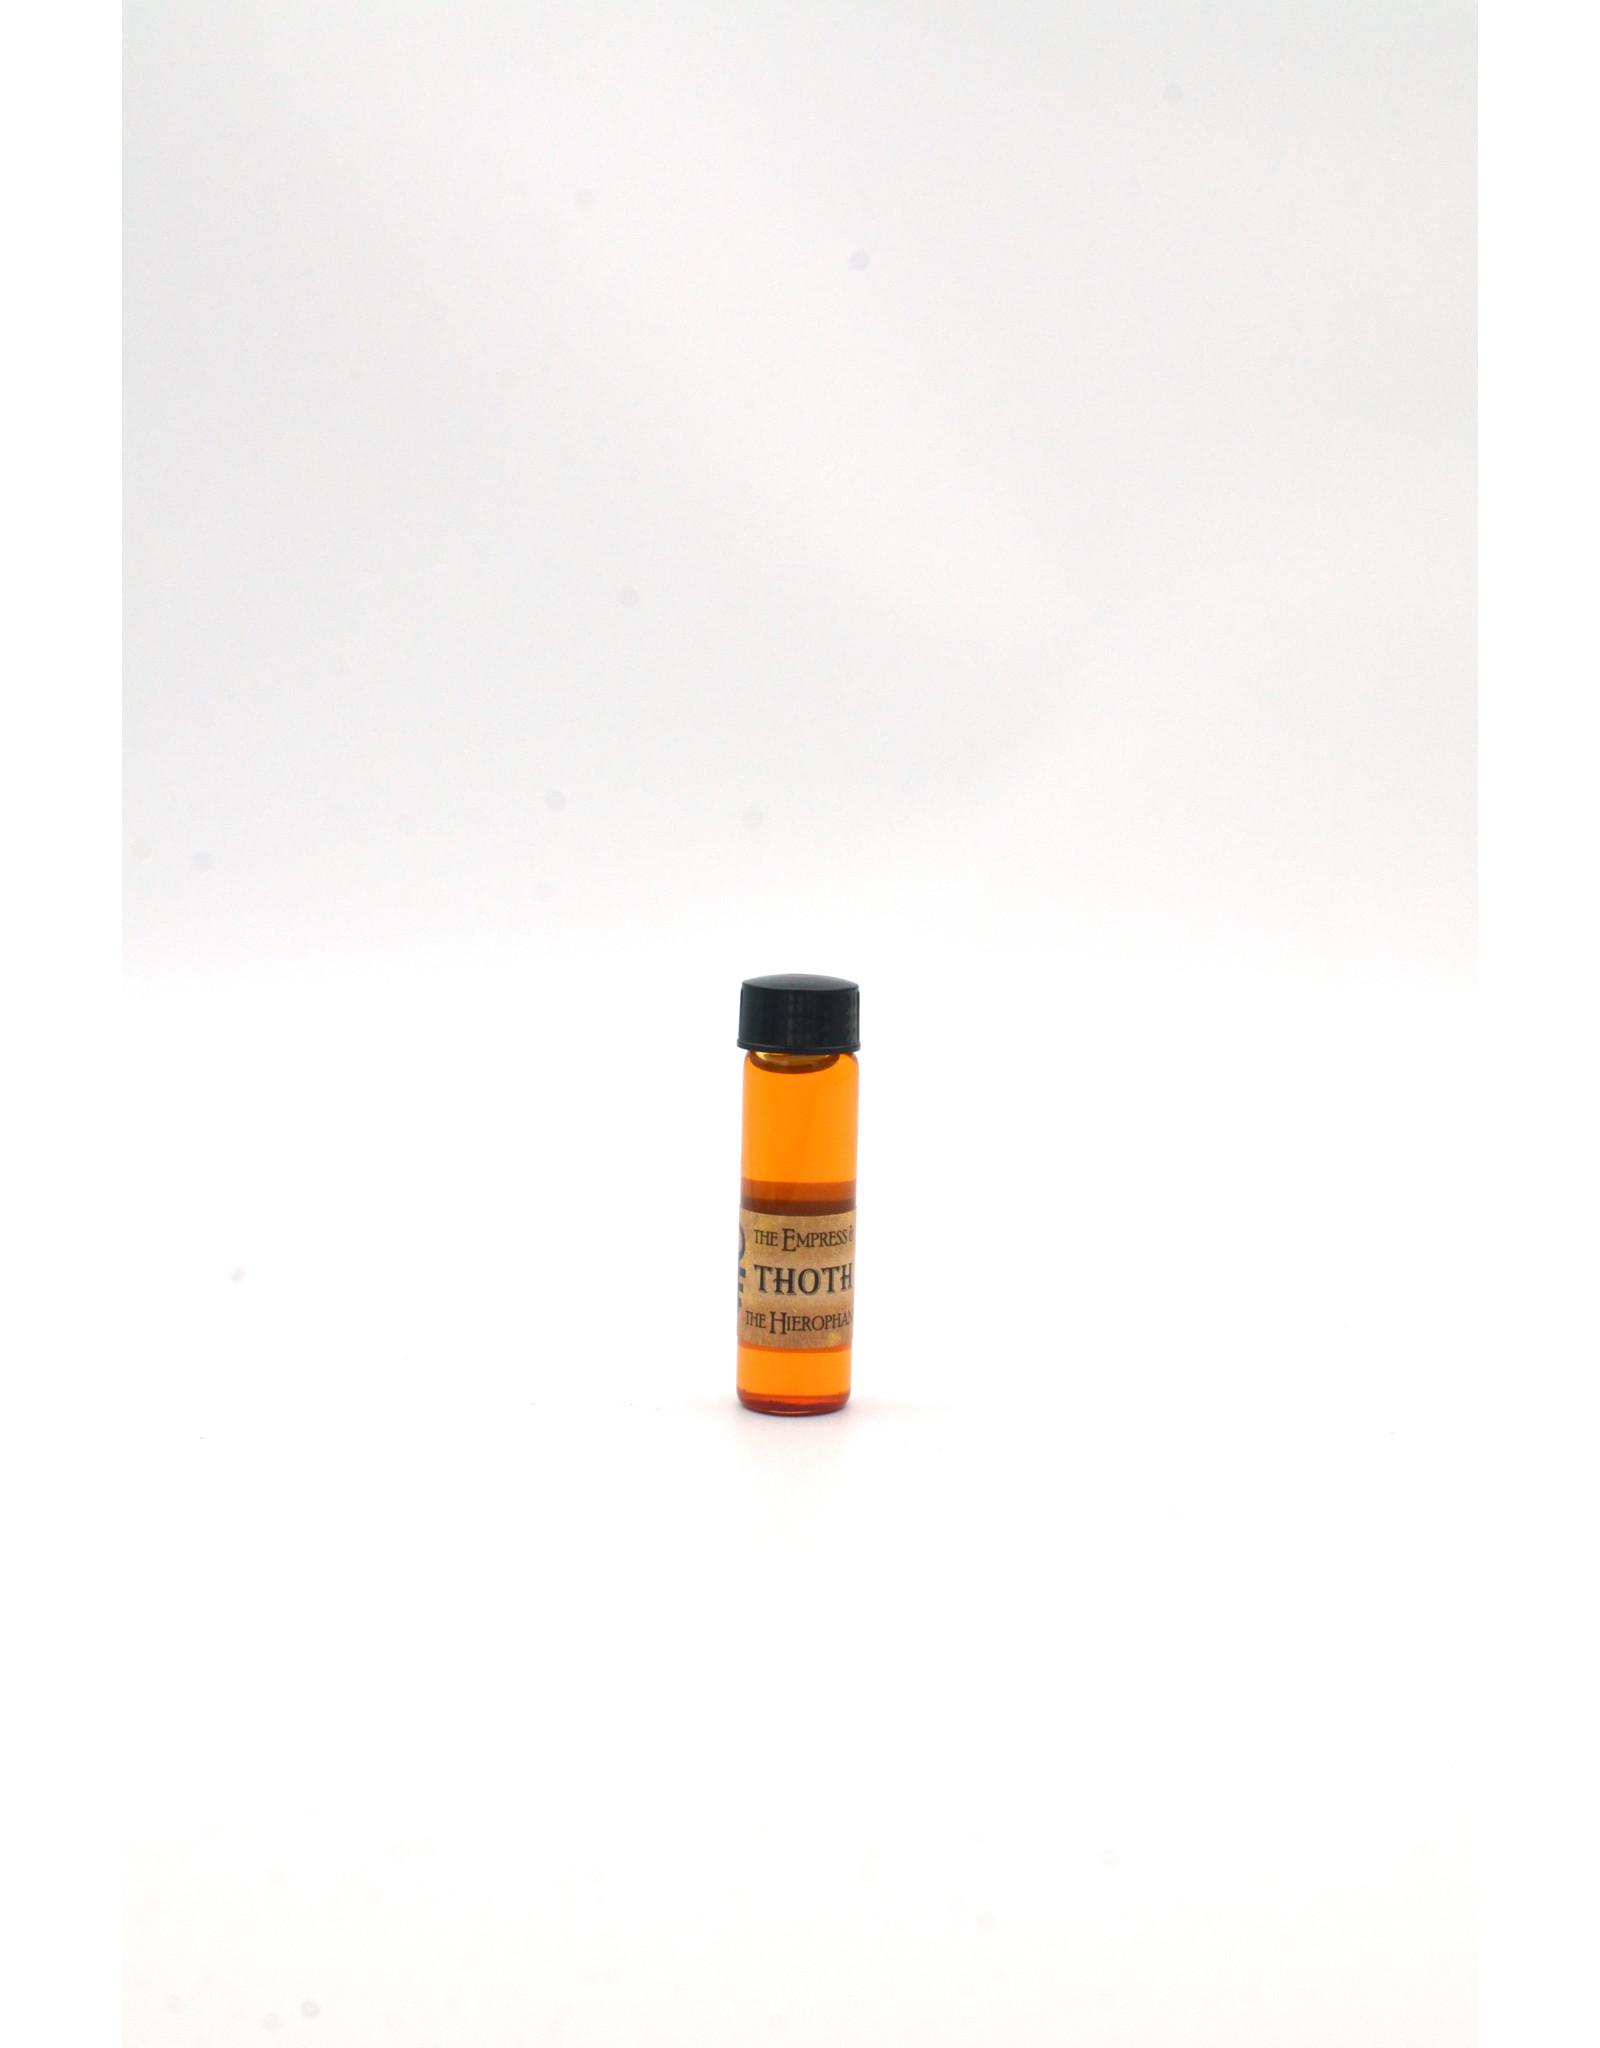 Thoth Magickal Oil 2 Dram Bottle